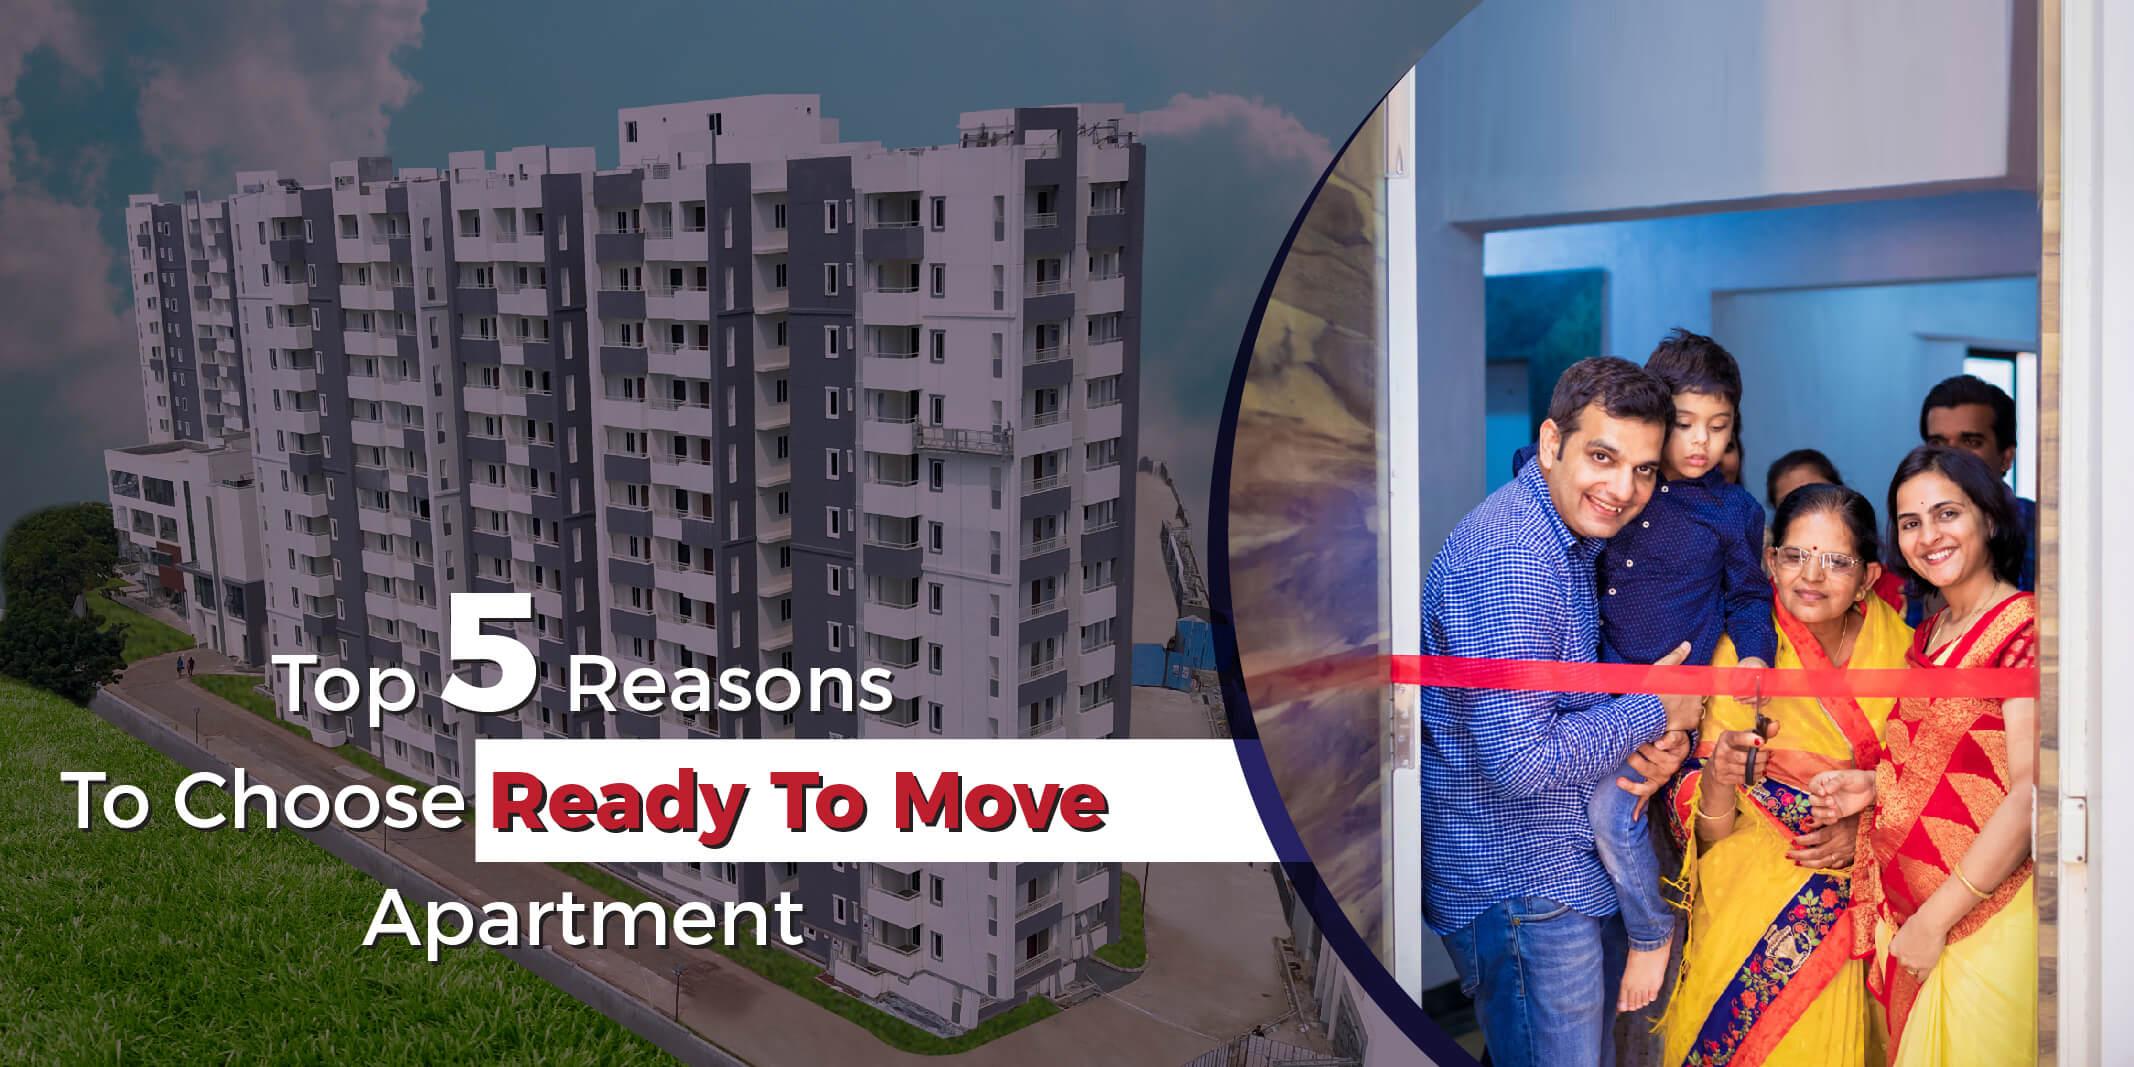 Premium 3 BHK ready to move in apartments in Gachibowli, Hyderabad